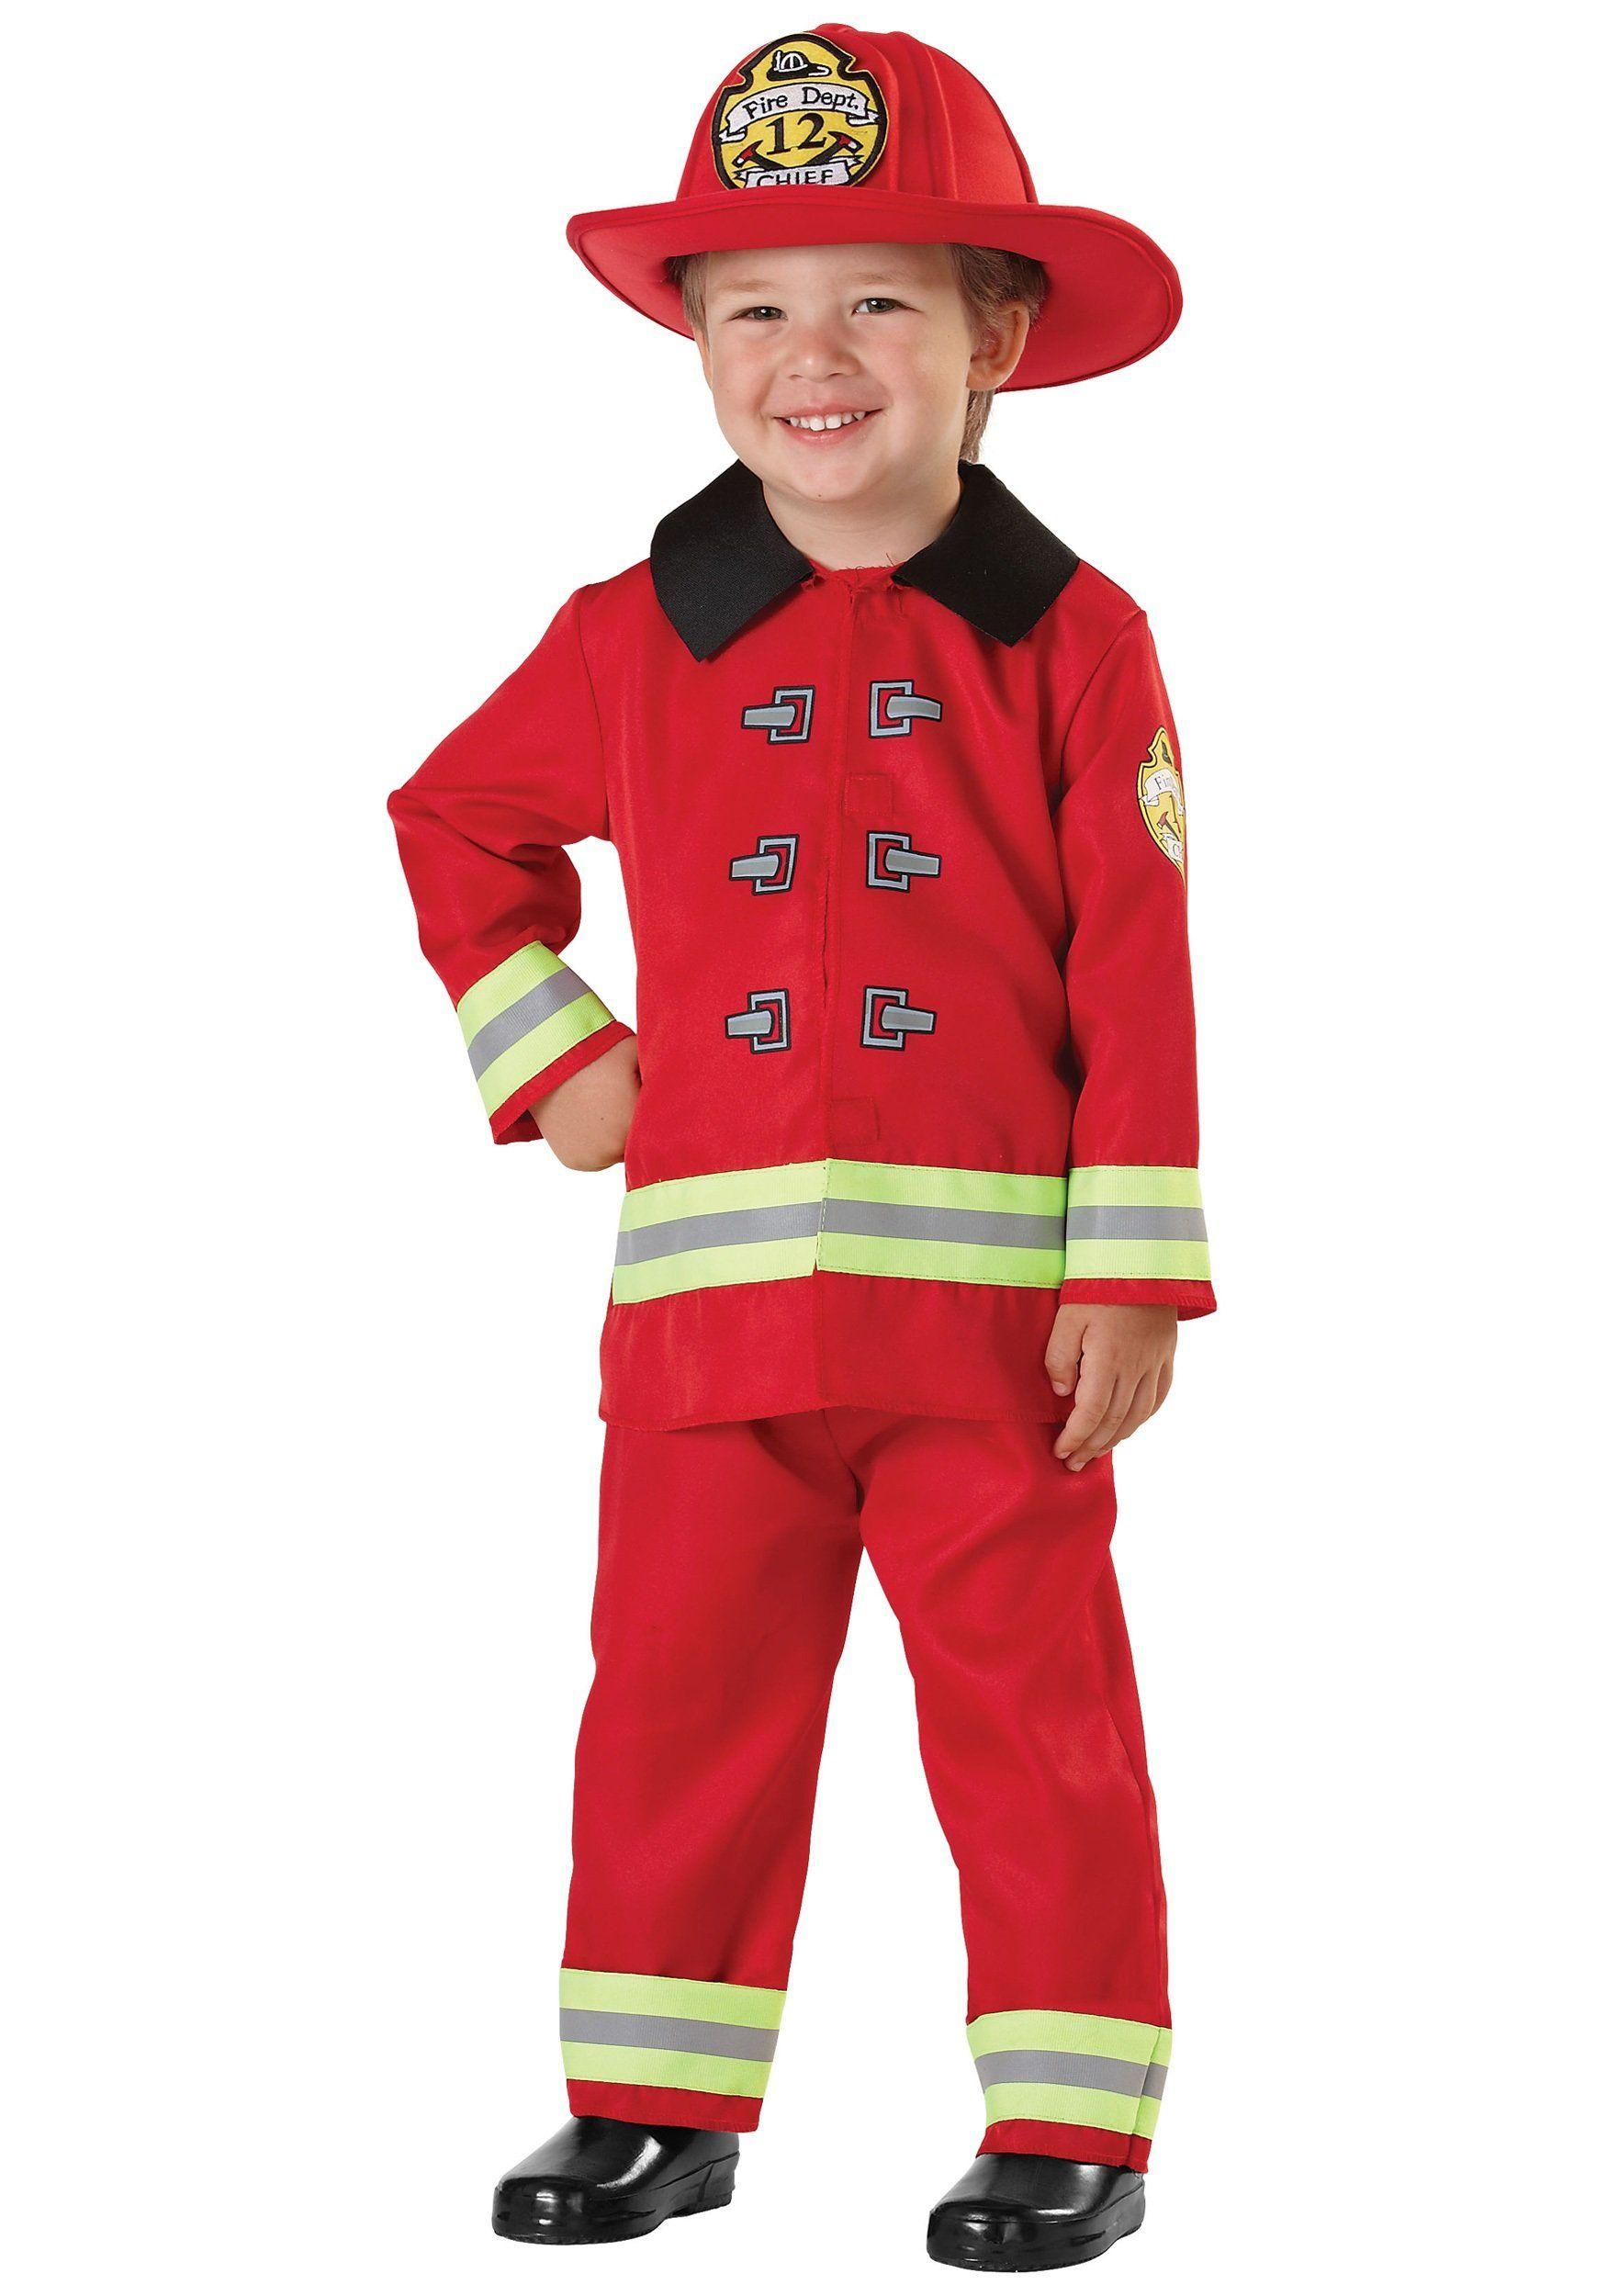 d74170073 AmazonSmile  Toddler Fireman Costume  Clothing Disfraz De Bombero Niños